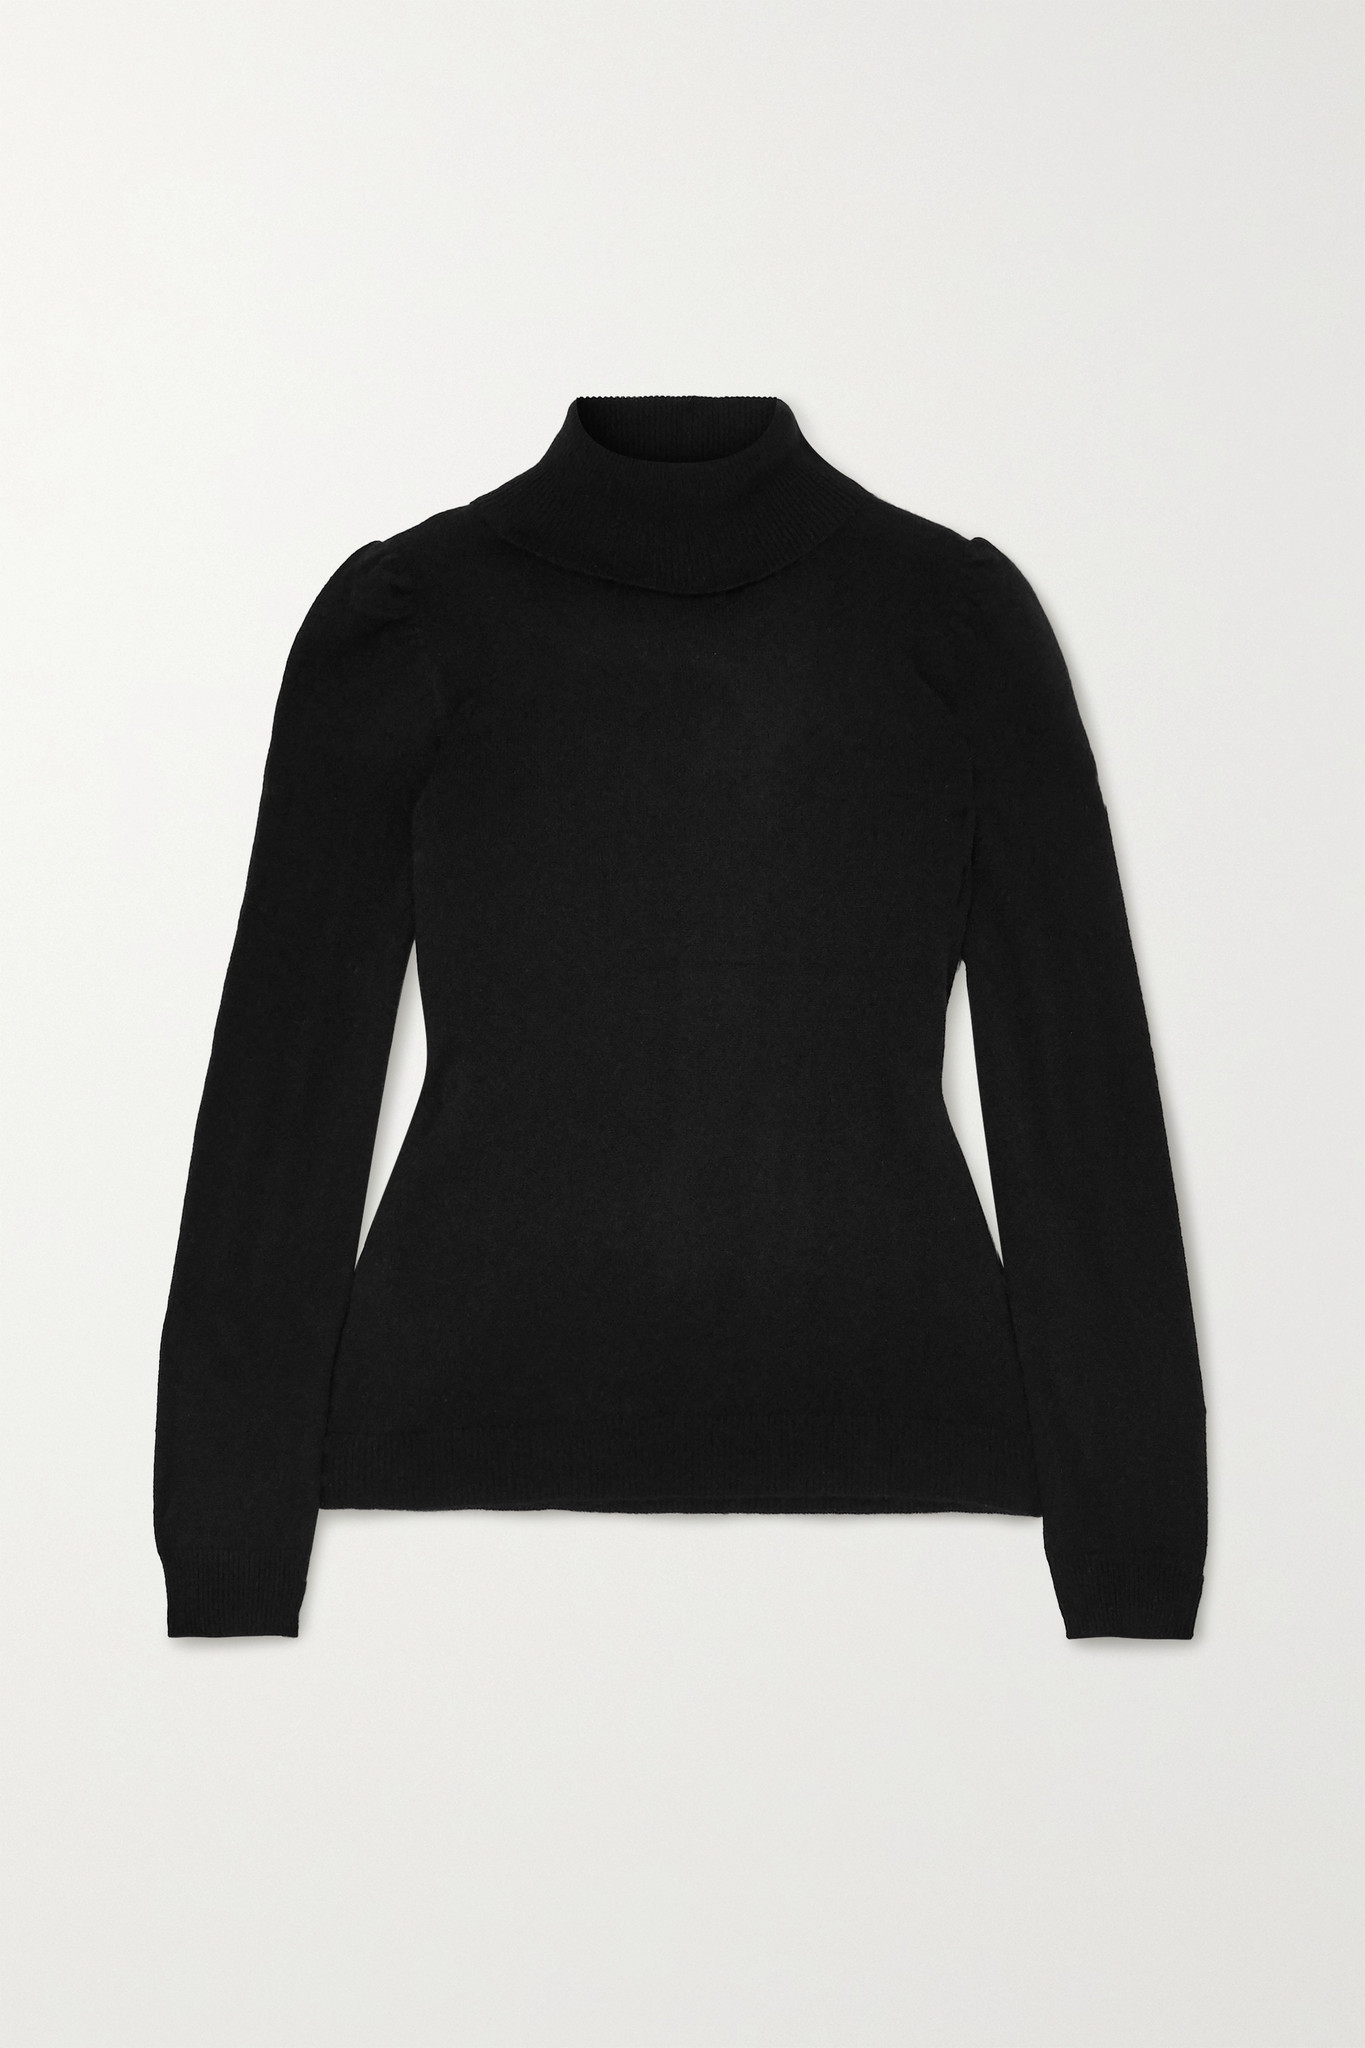 MADELEINE THOMPSON - 羊绒高领毛衣 - 黑色 - small